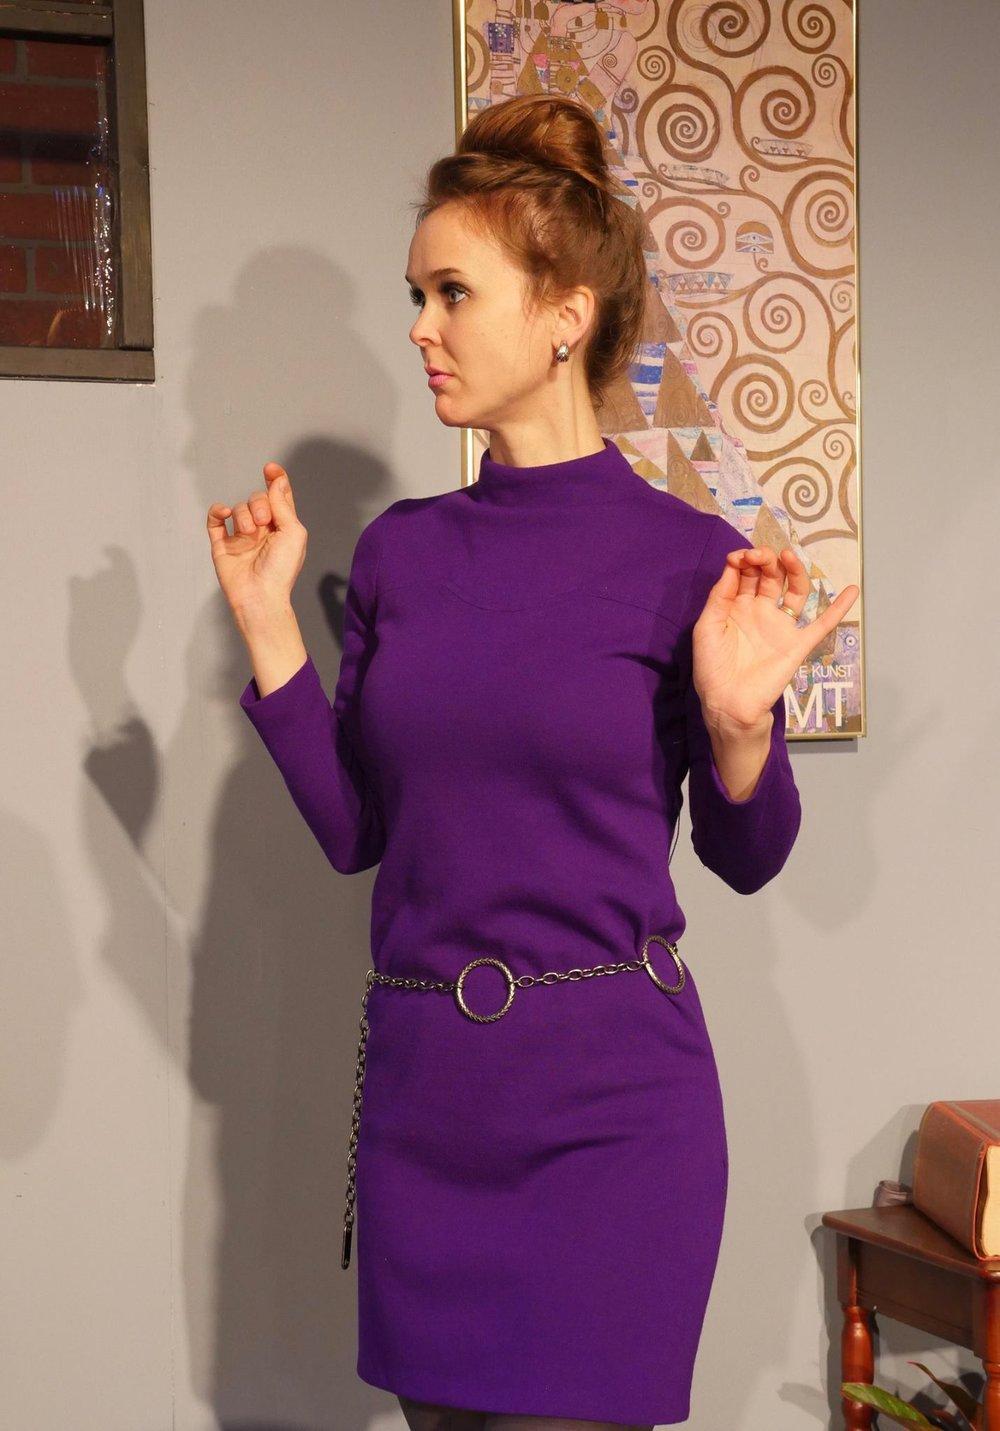 Barefoot Still - Purple Dress 1.jpg